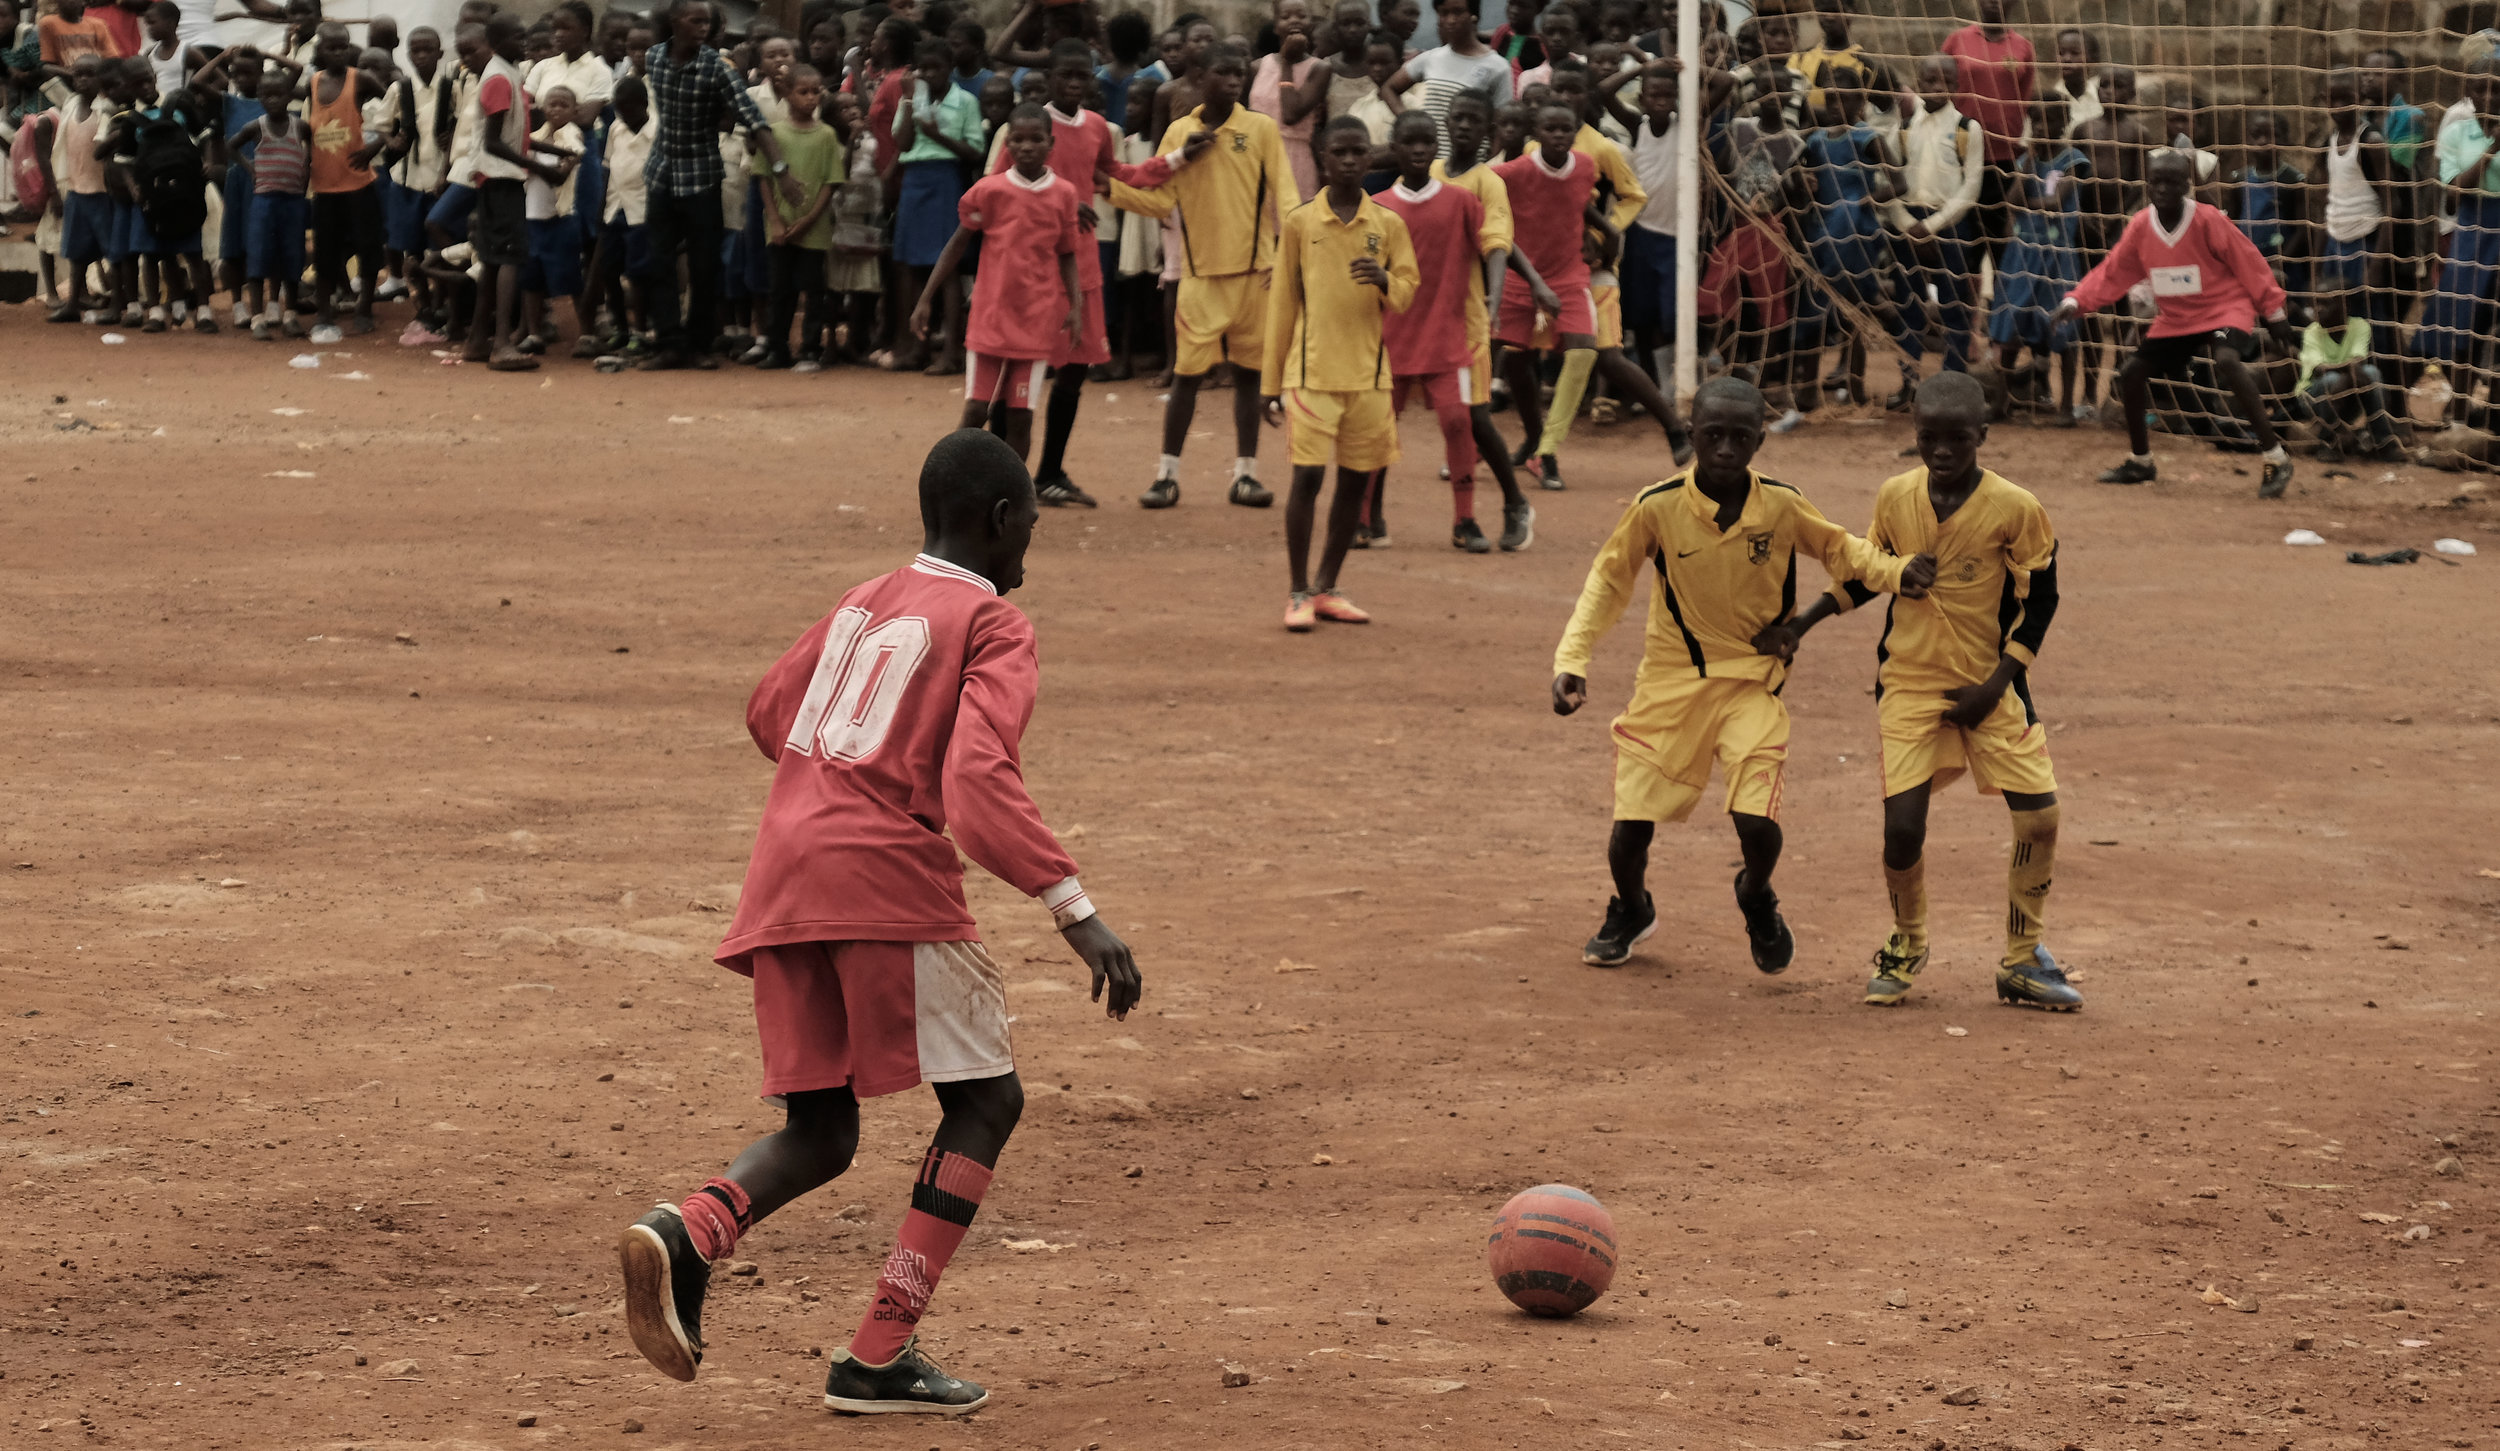 WYCF_Football5.jpg